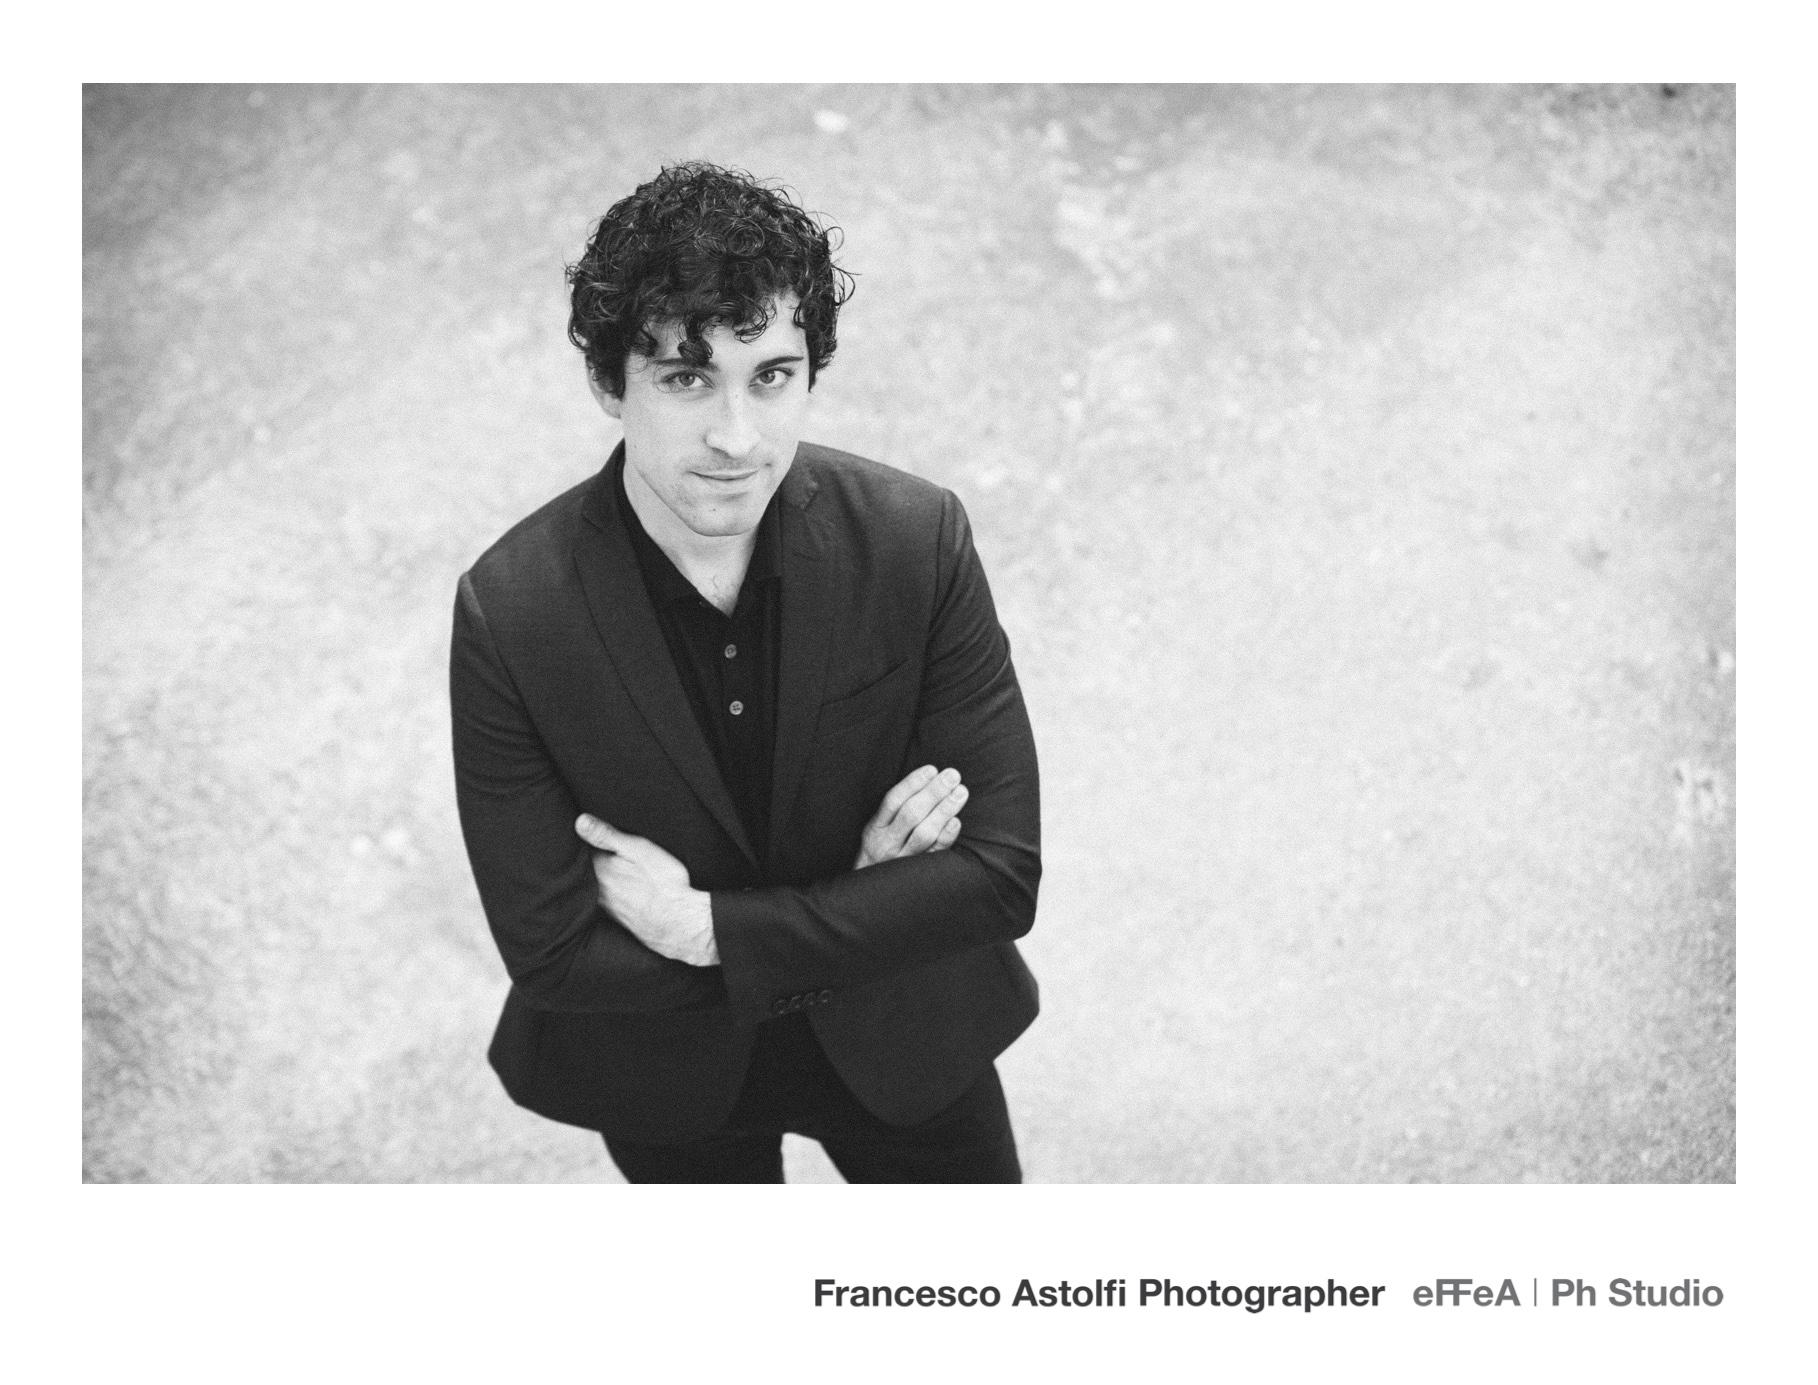 006 - Gentile Catone - Photo by Francesco Astolfi